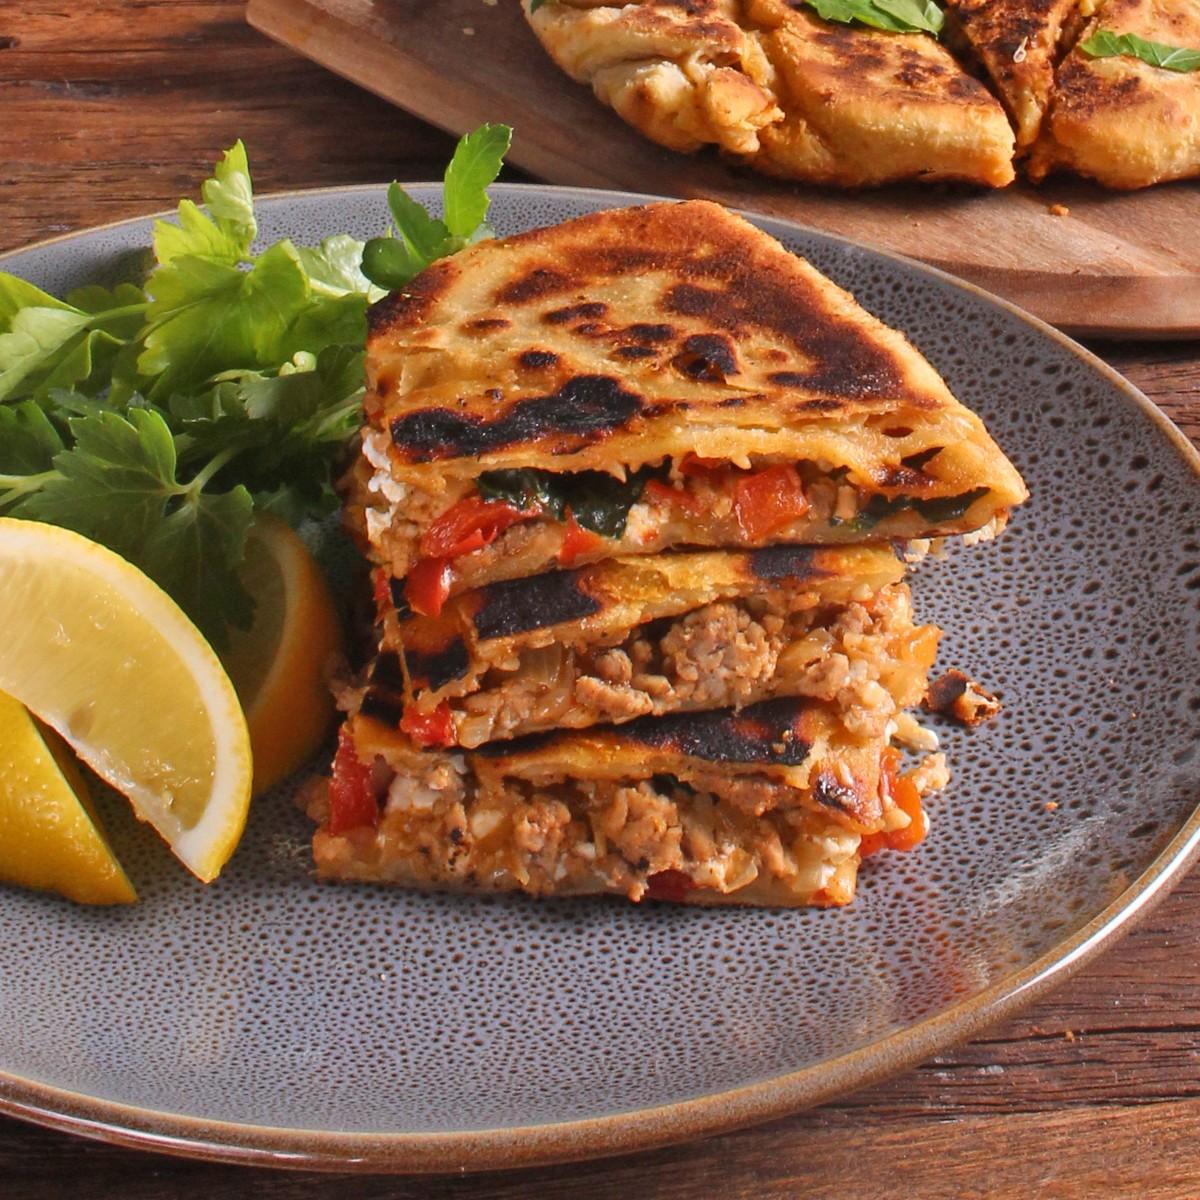 Turkish Gozleme with Ground Pork - SunPork Pork Mince